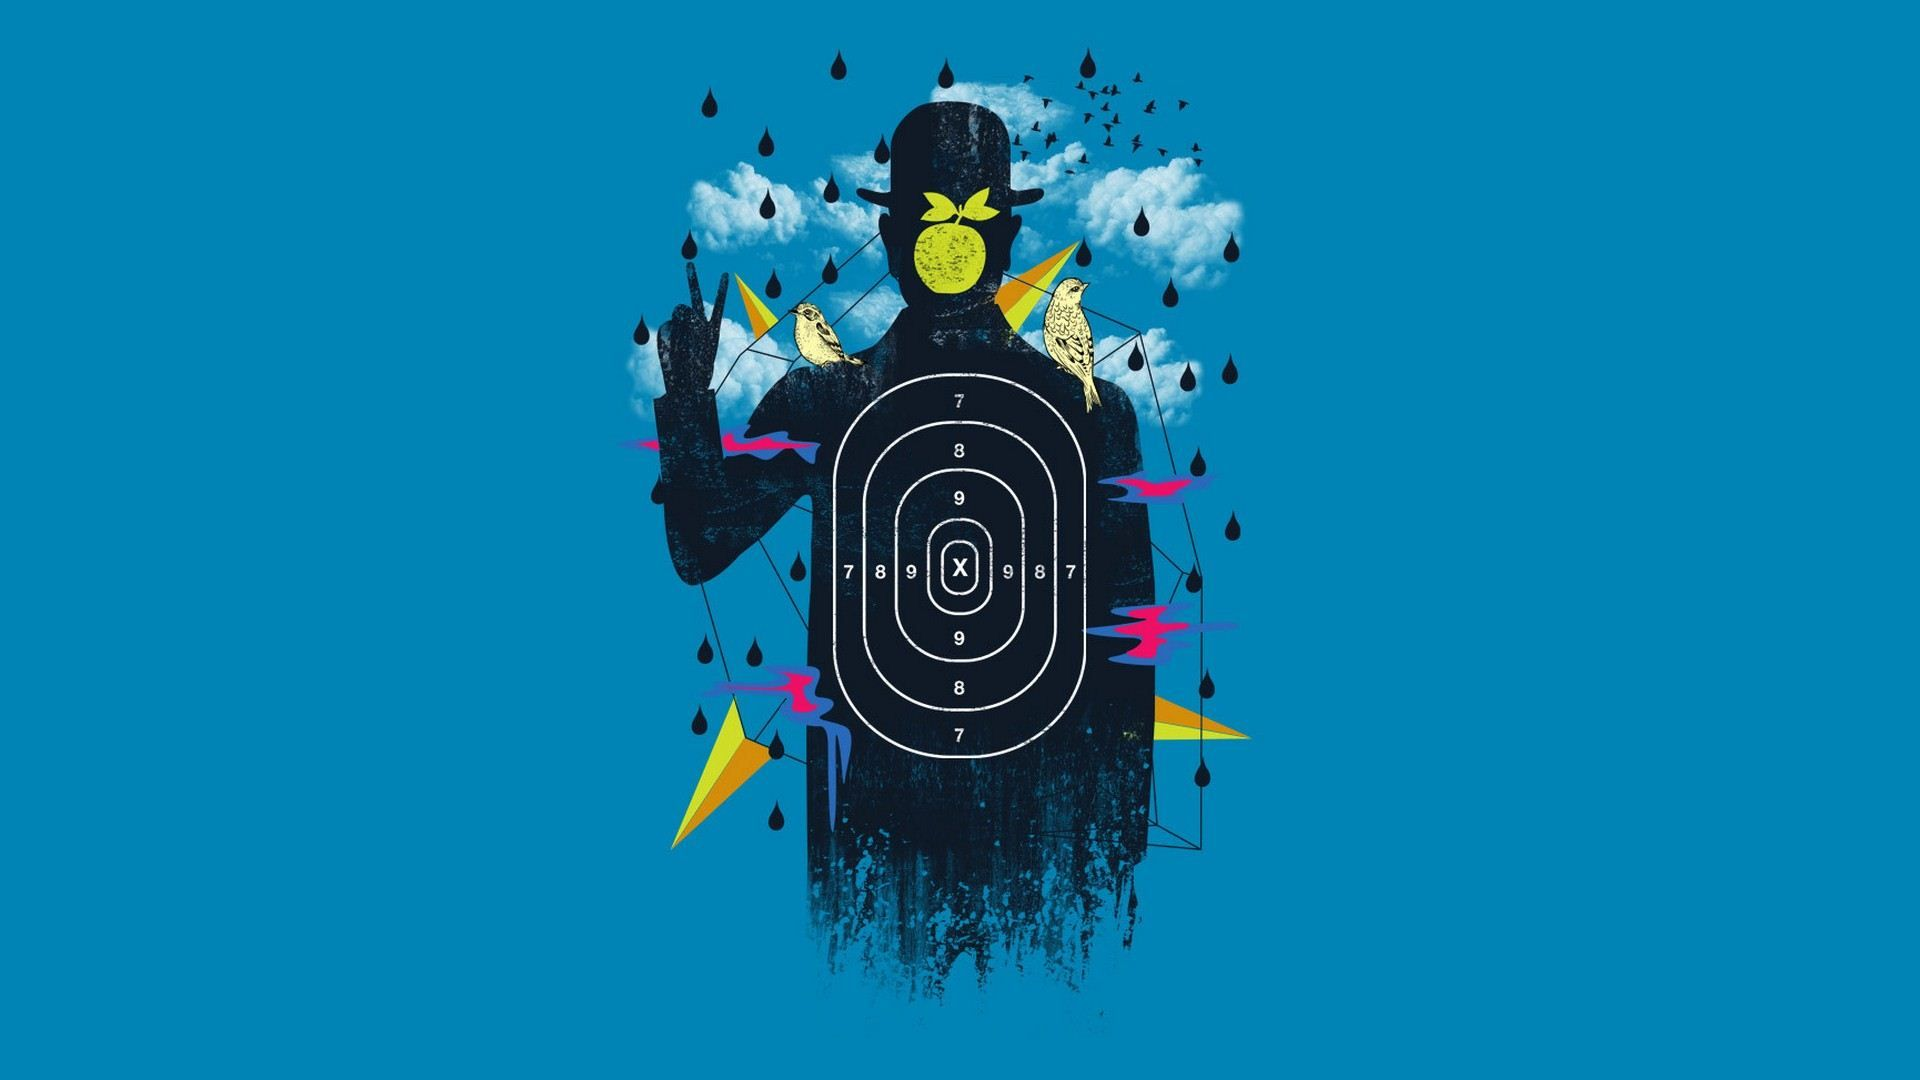 Targeting Wallpapers Top Free Targeting Backgrounds Wallpaperaccess